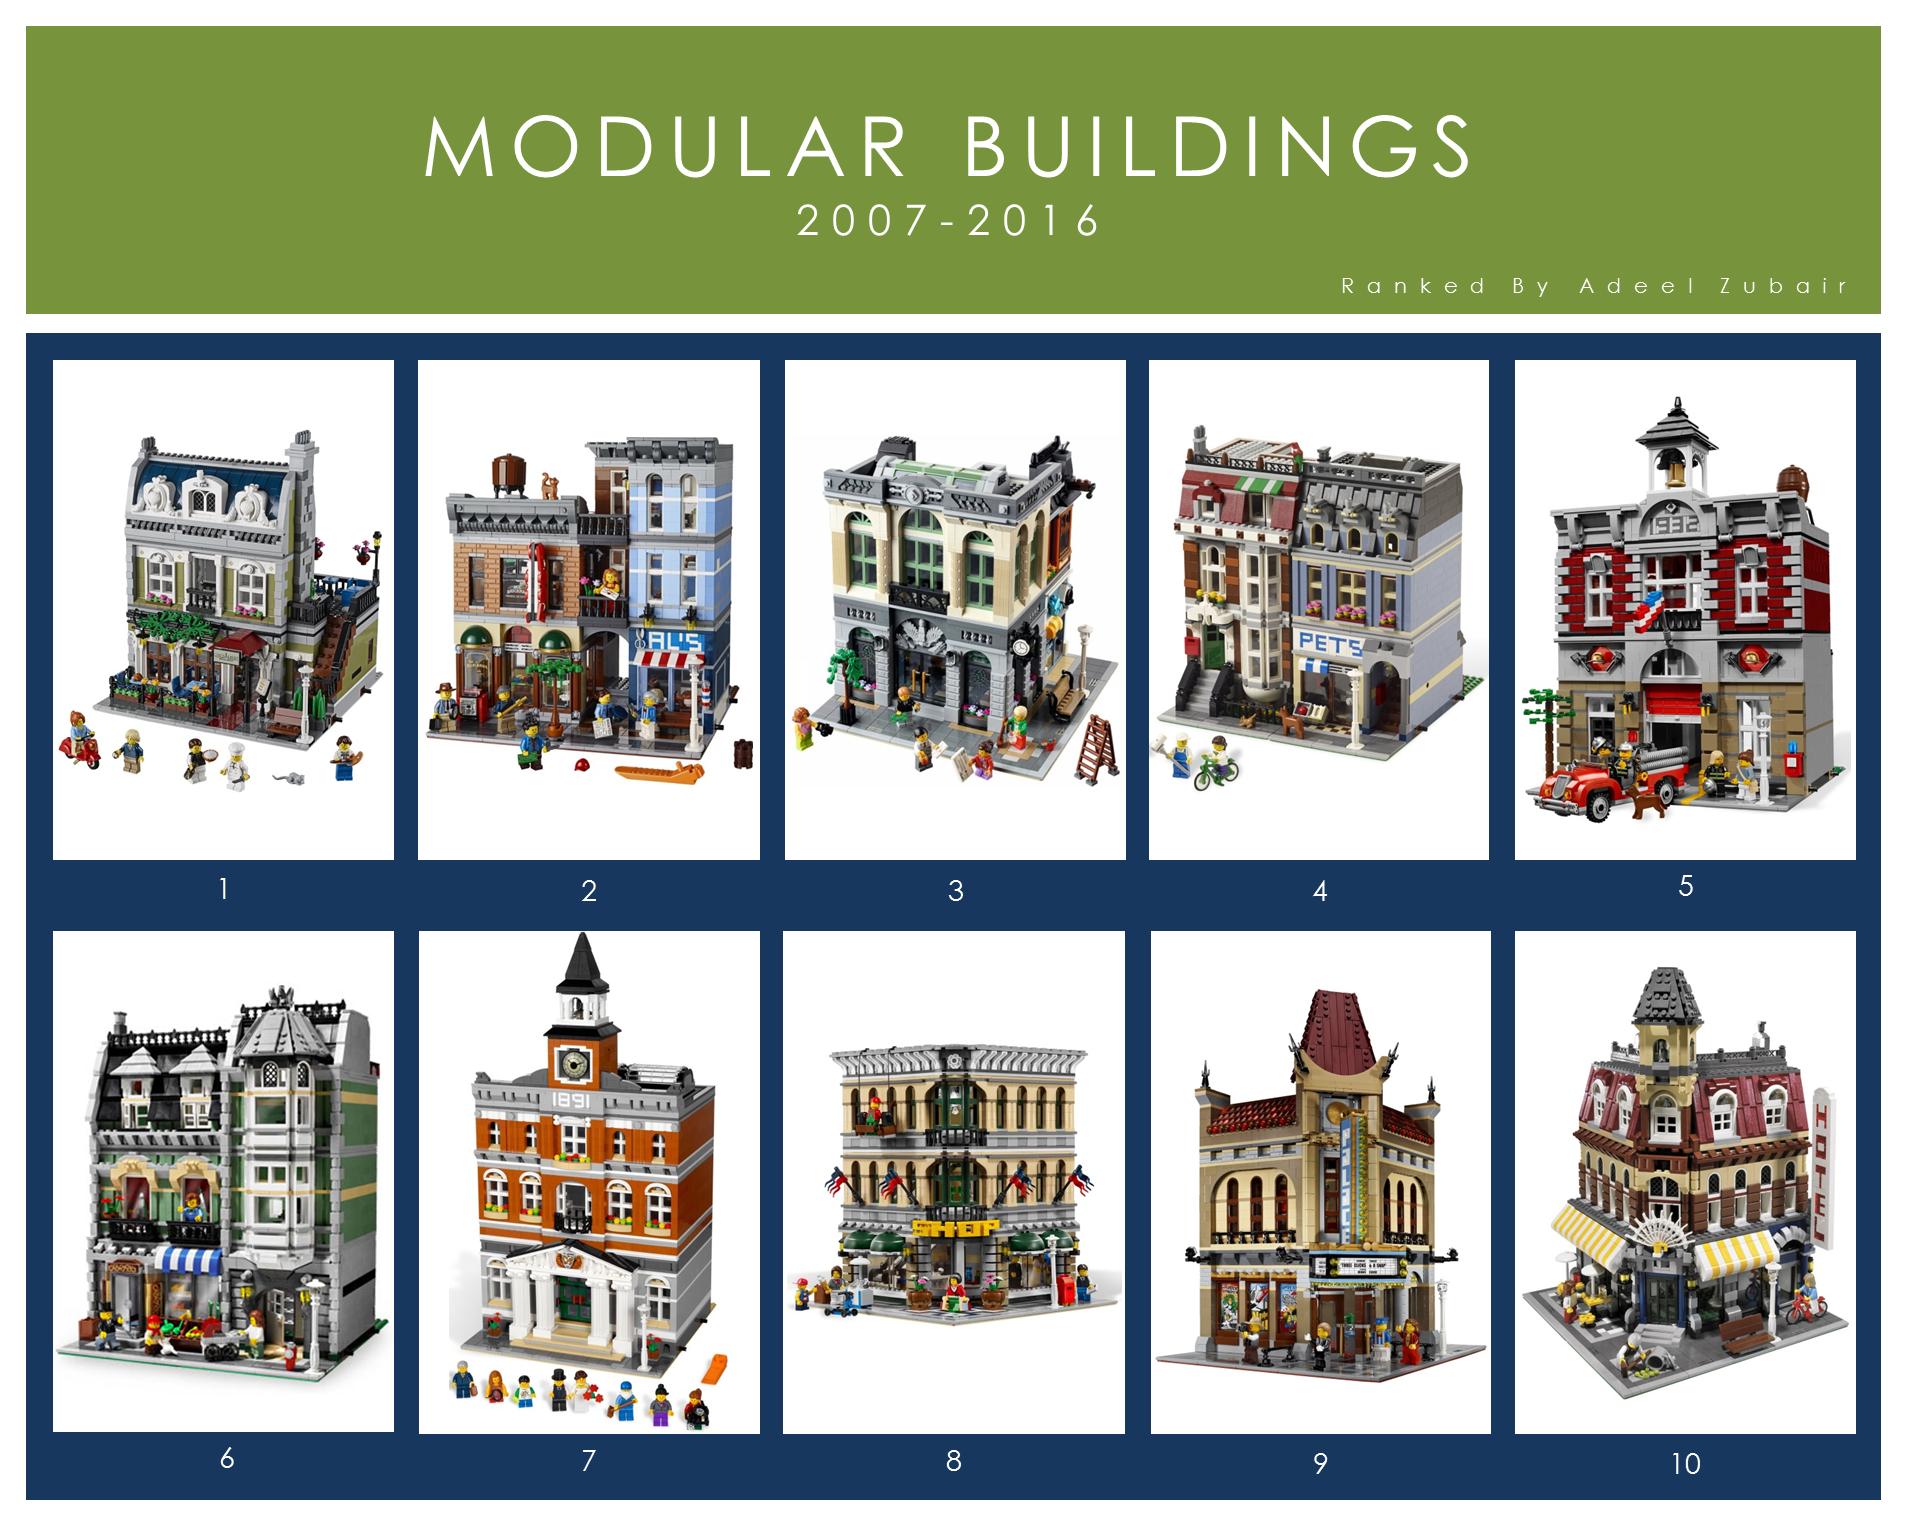 Ranking The Lego Modular Buildings 1 11 Brickset Forum